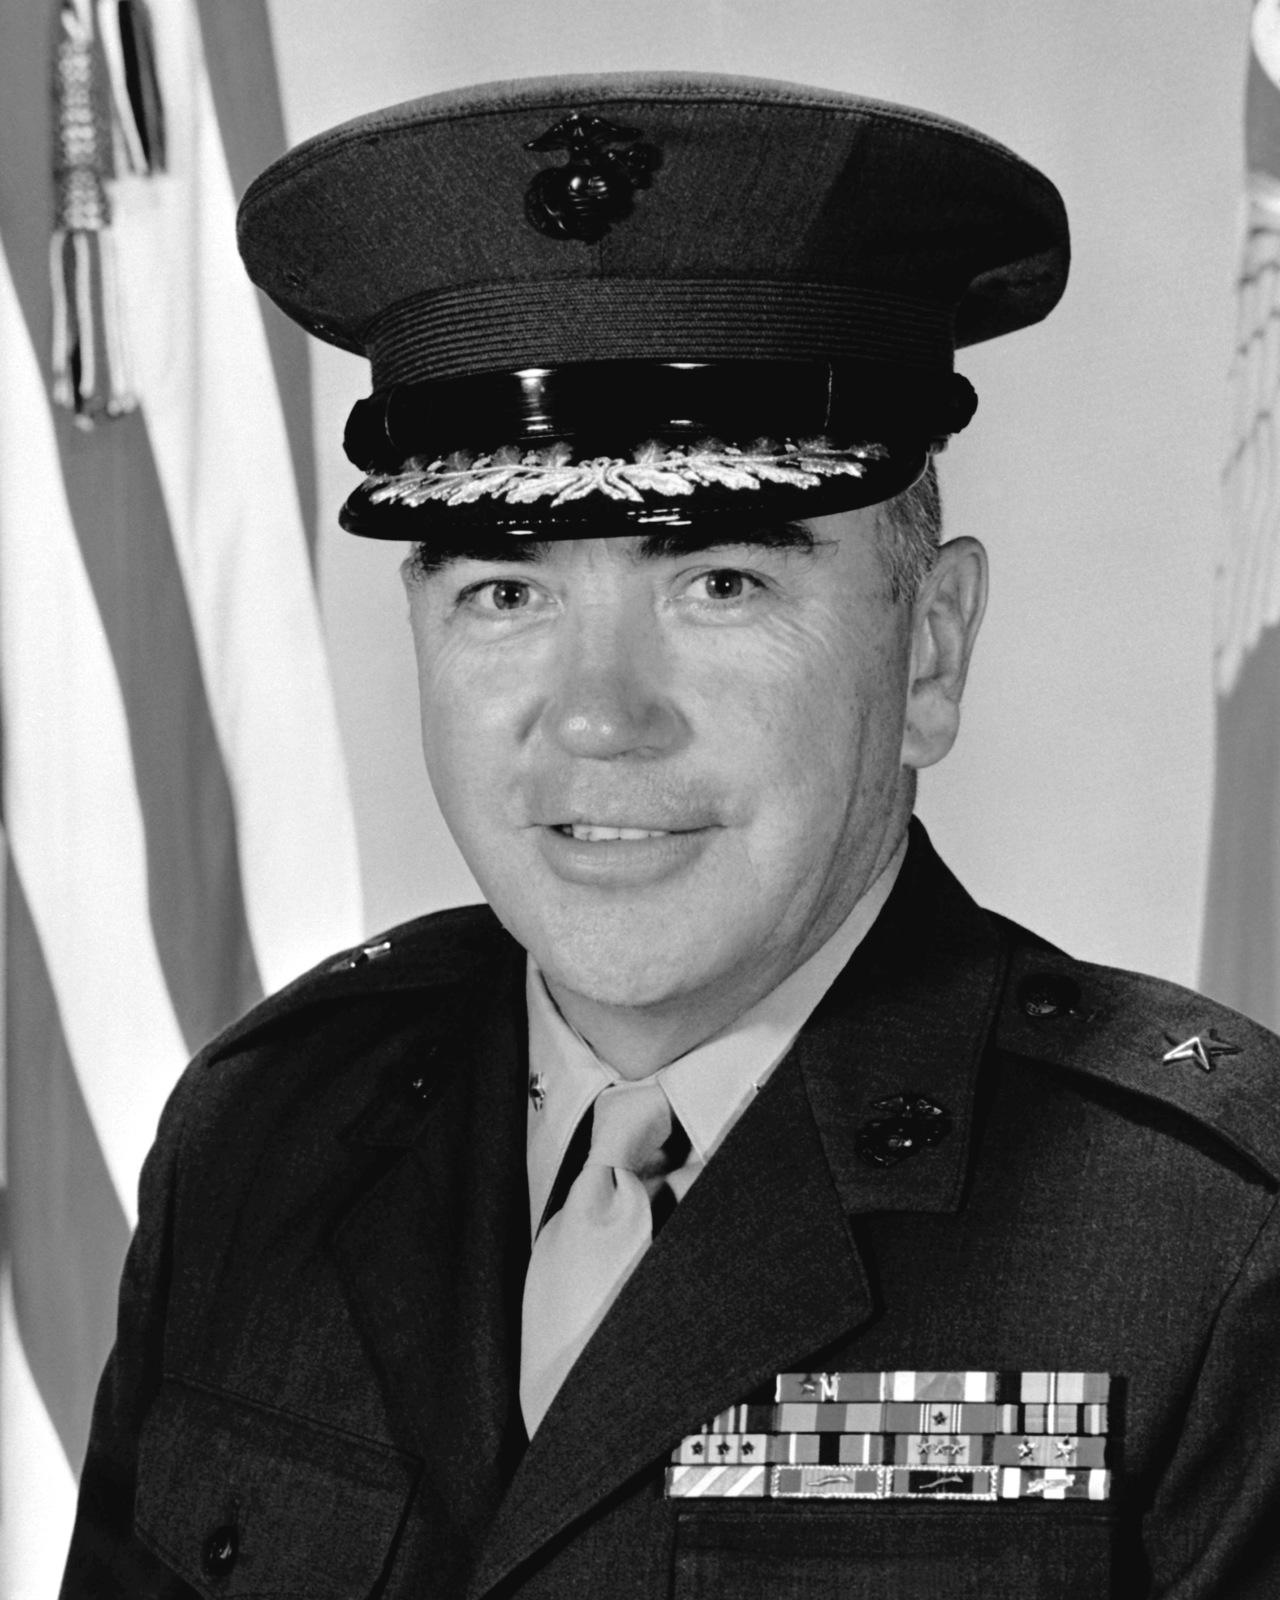 BGEN Edmund P. Looney Jr., USMC (covered)